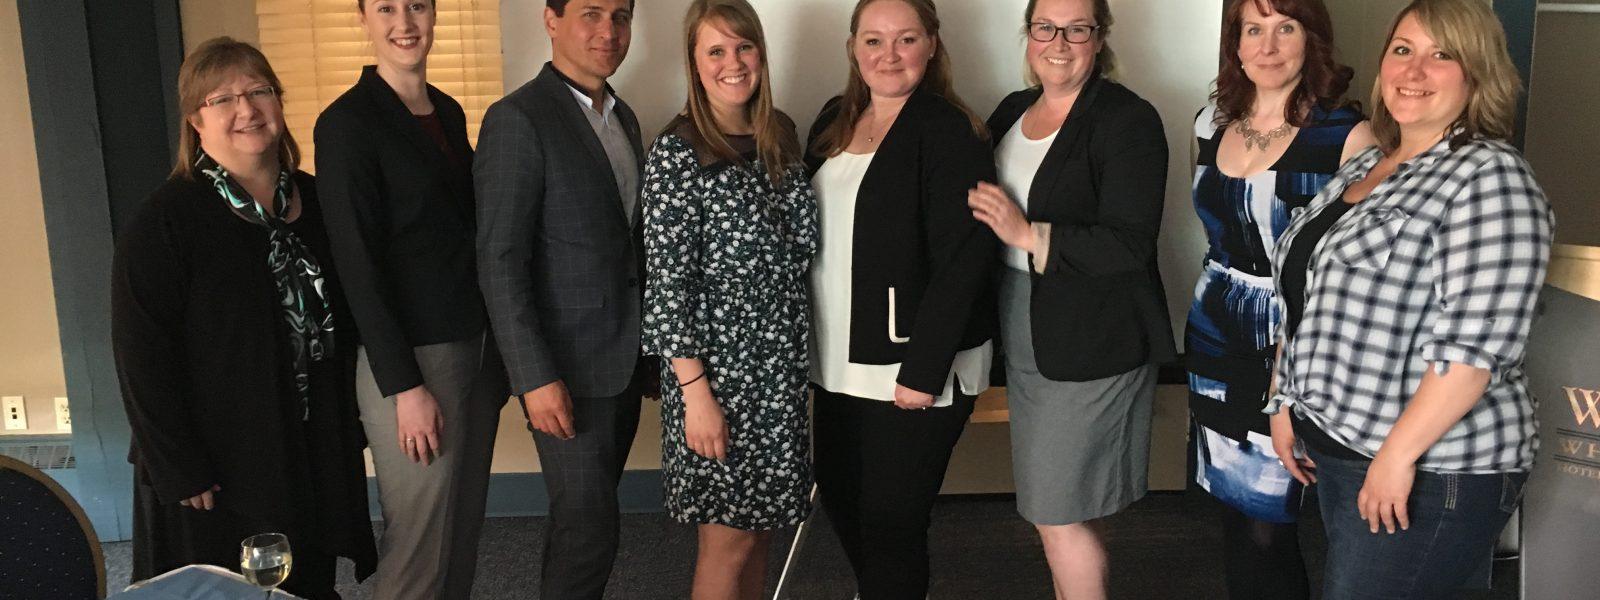 Welcoming our 2018-2019 Board Members